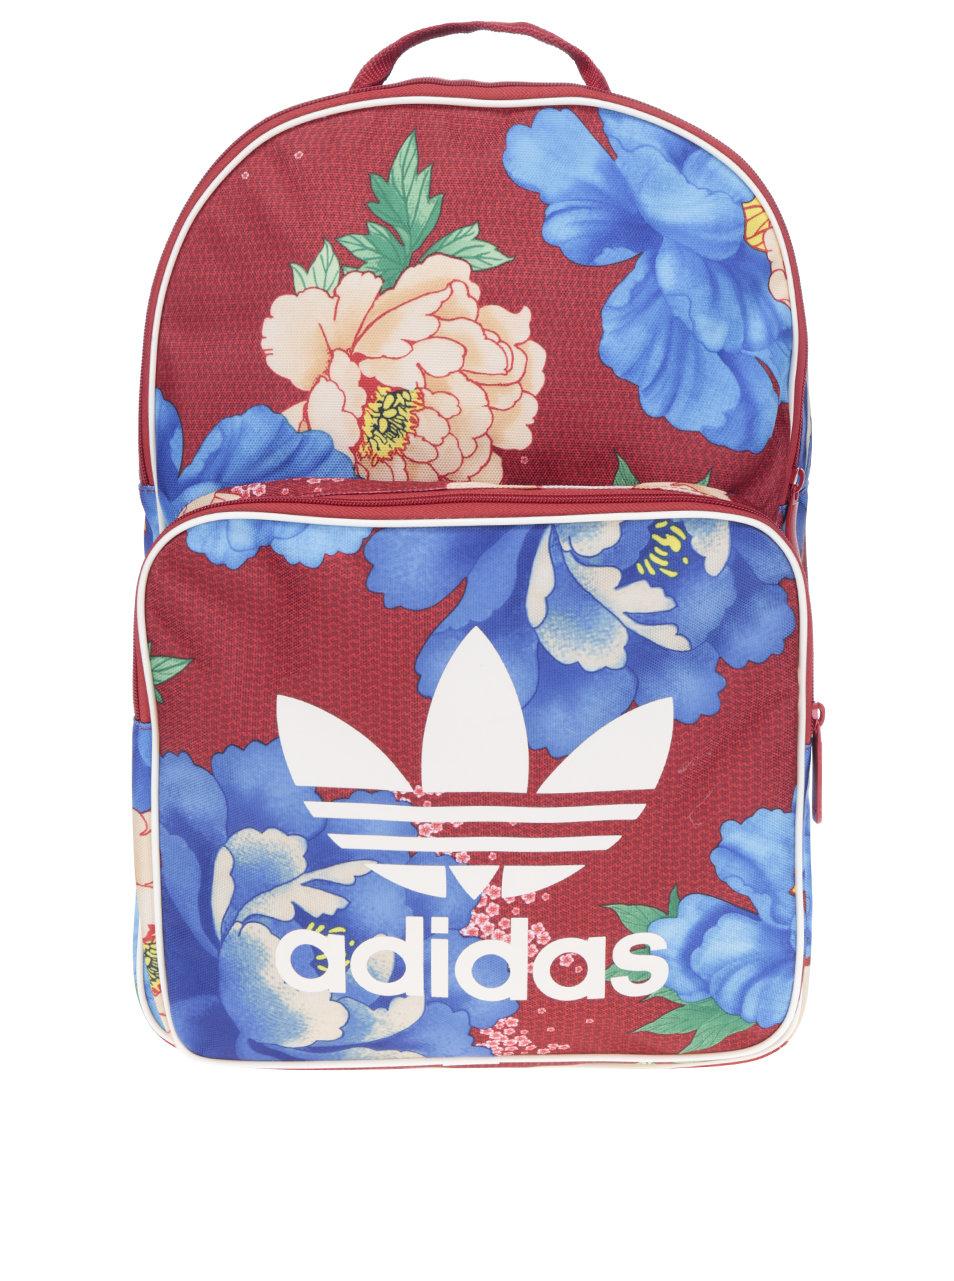 Červený dámský květovaný batoh adidas Originals ... 5a1df0e88b3